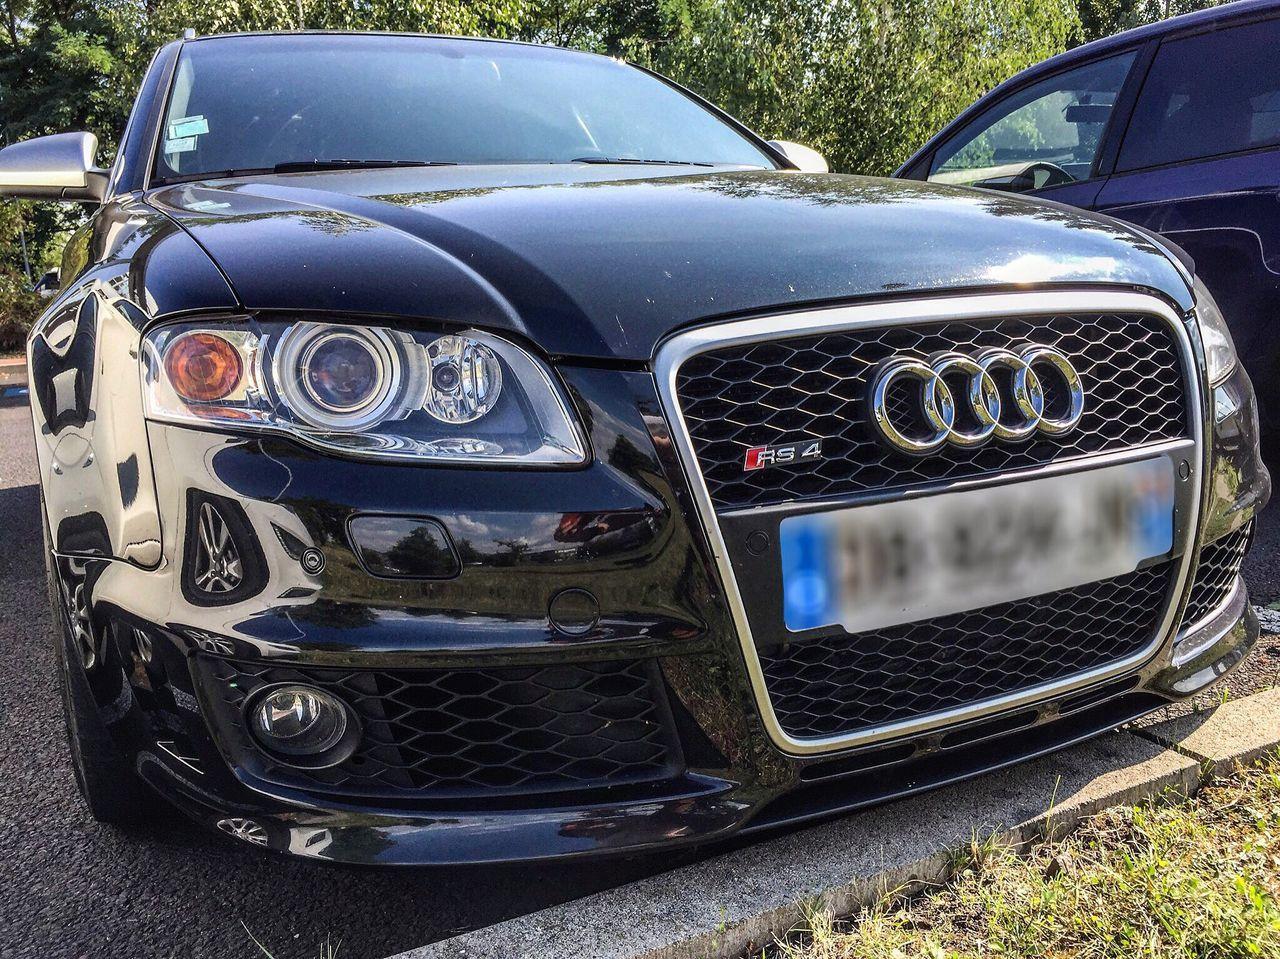 Audi RS4 Audi Rs4 Germany German